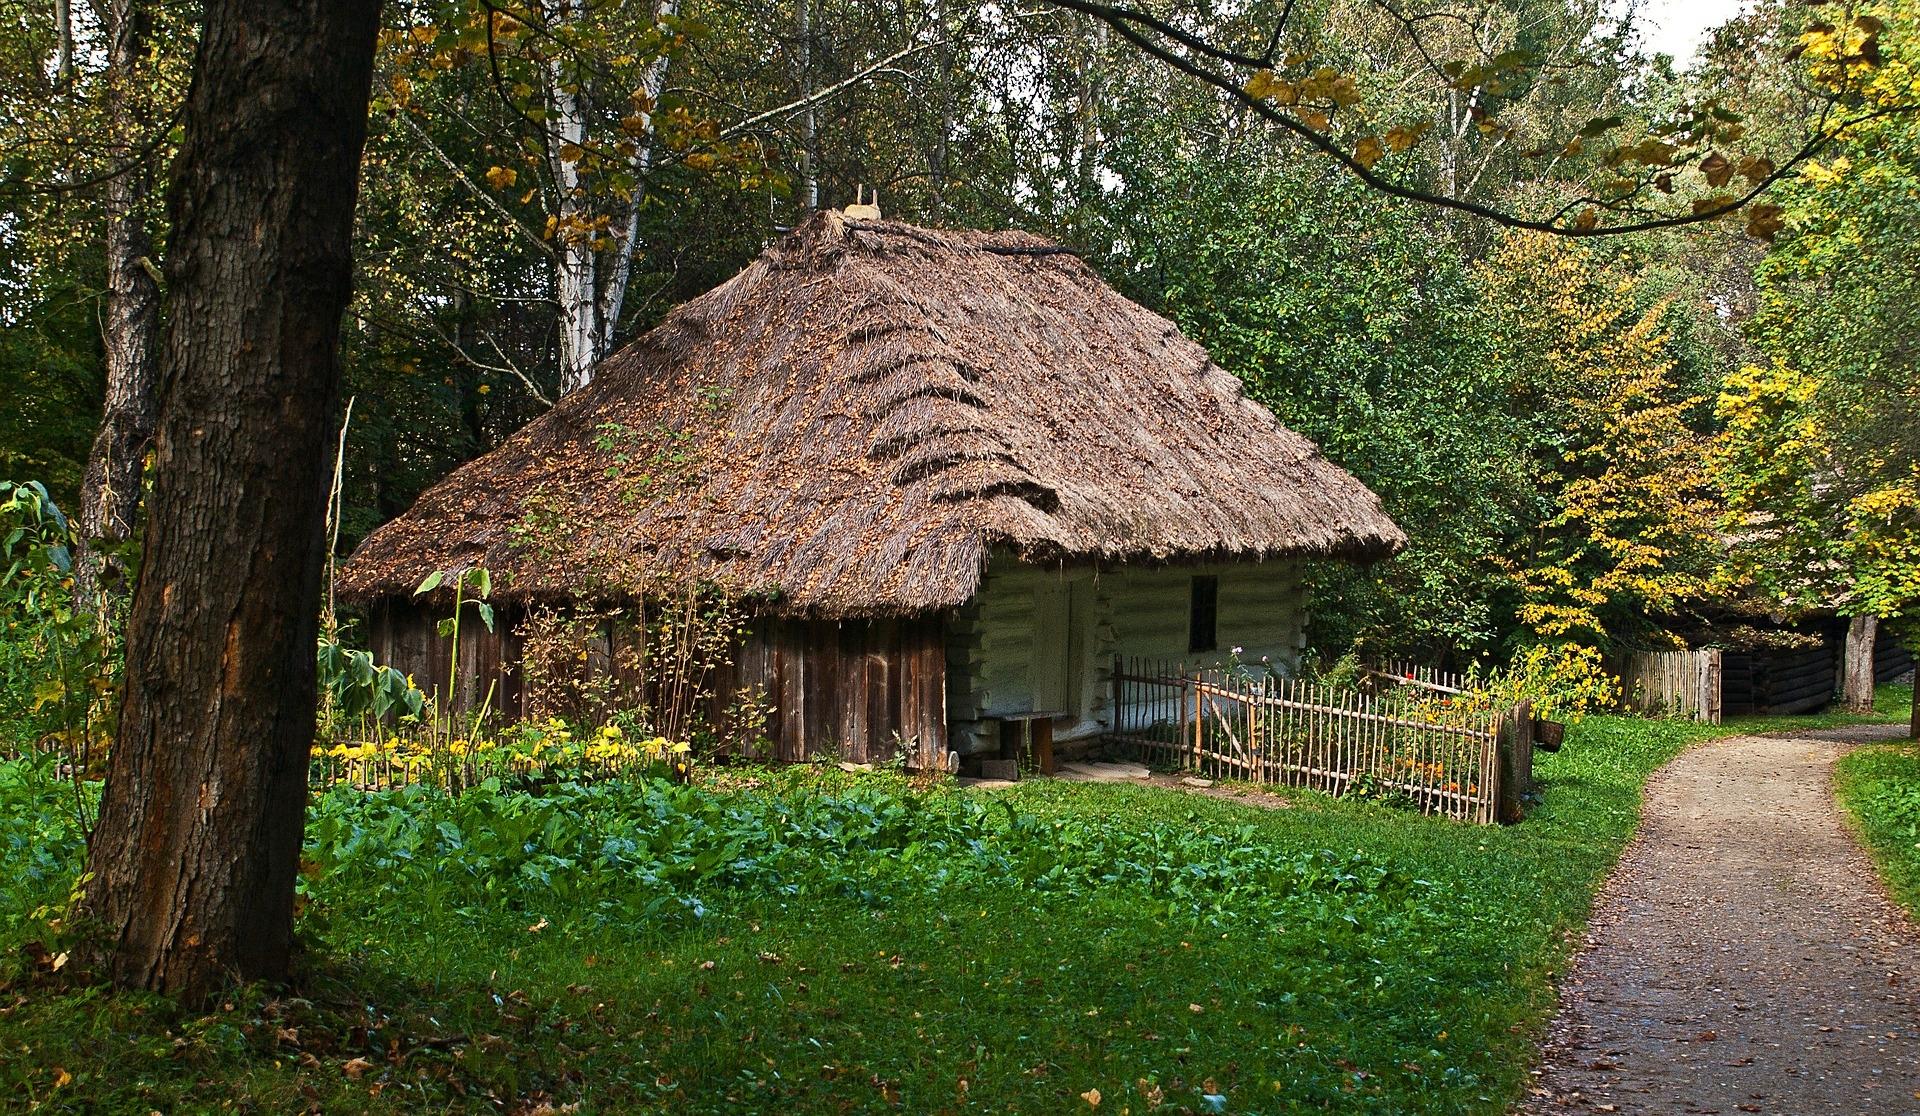 casa madera, Polonia, skansen